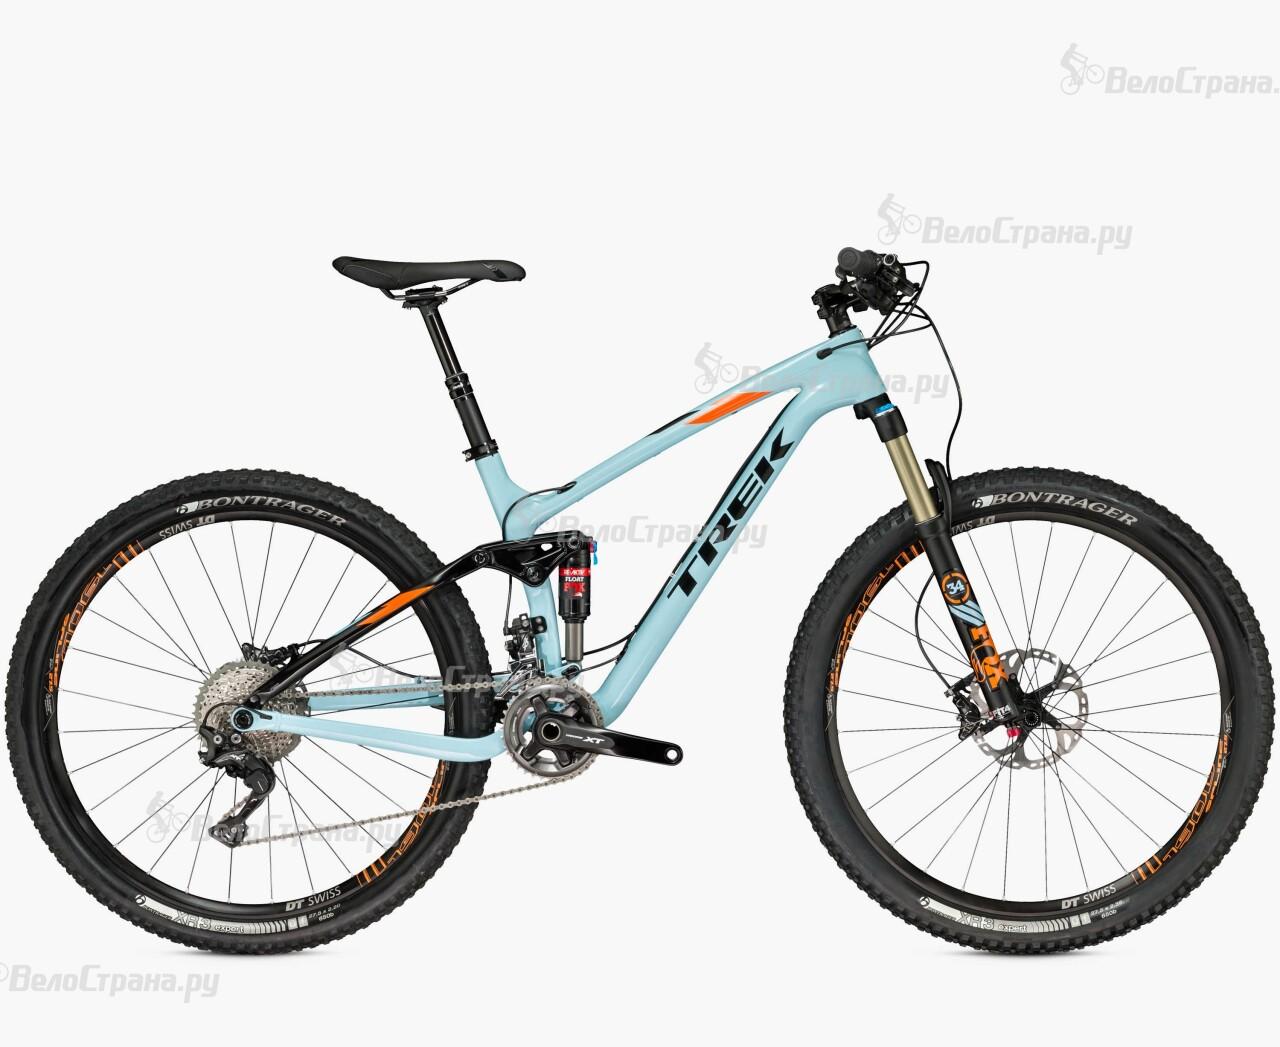 Велосипед Trek Fuel EX 9.8 27.5 (2016)